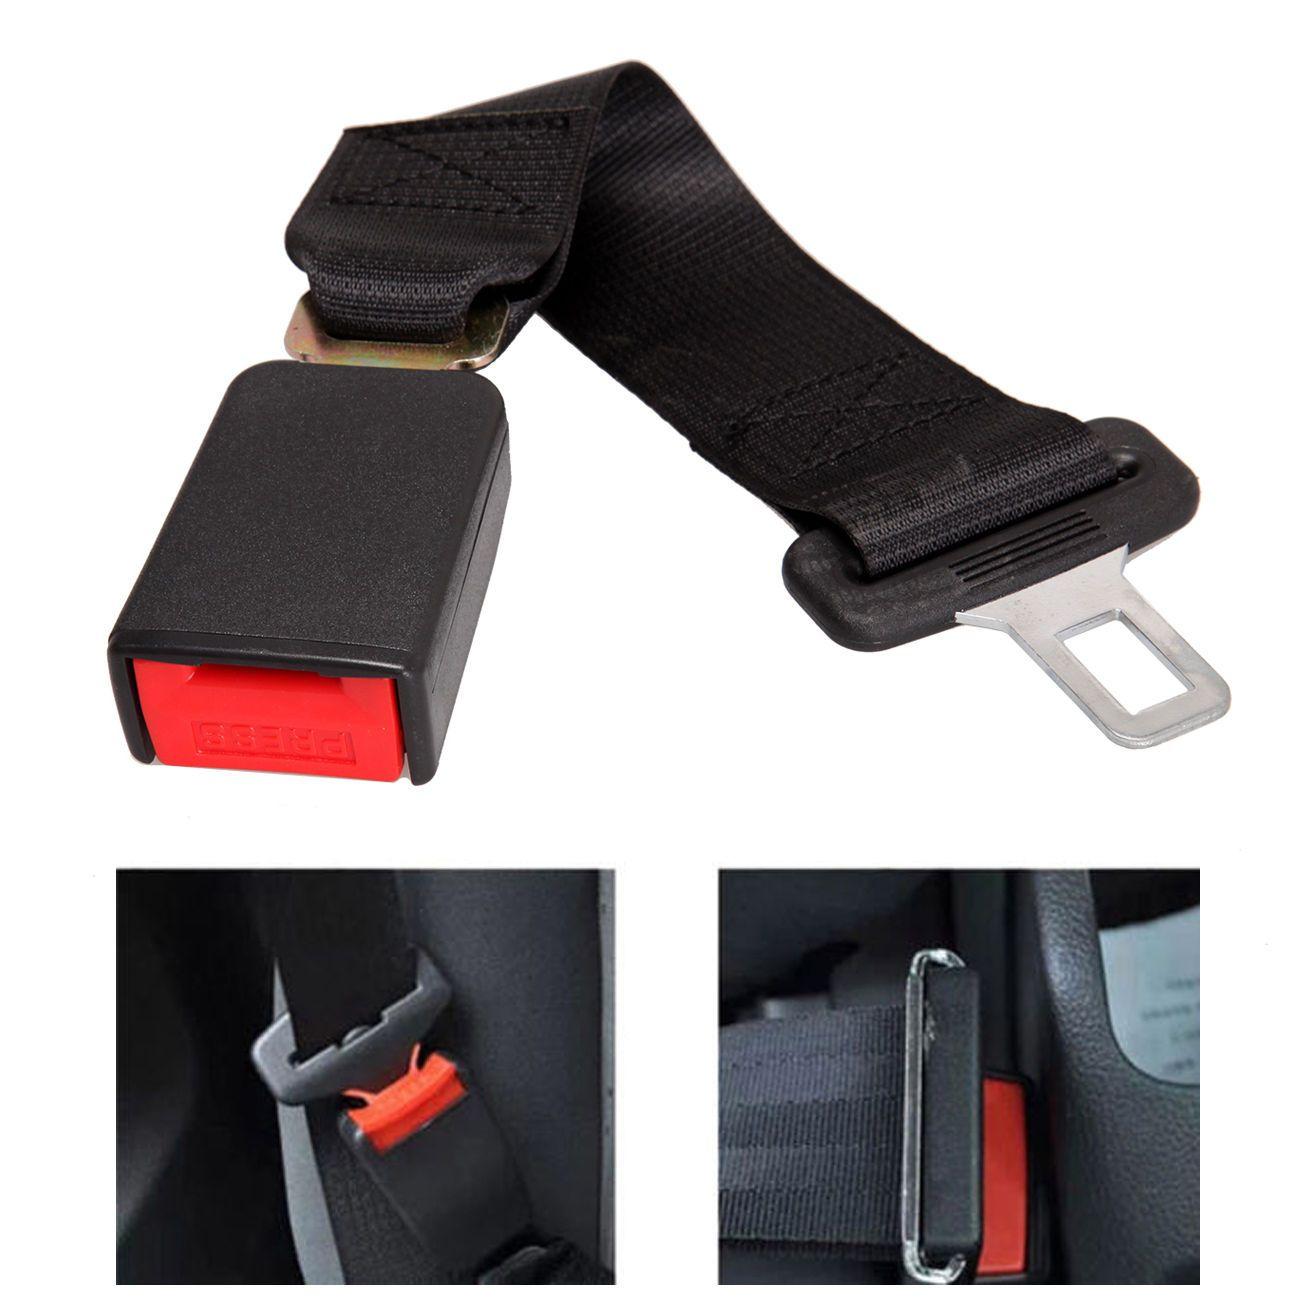 Universal Safety Seat Belt Adjustable Car Auto Safety Seat Belt Clip  Seatbelt Extension Extender Strap Buckle Safety Belts GGA980